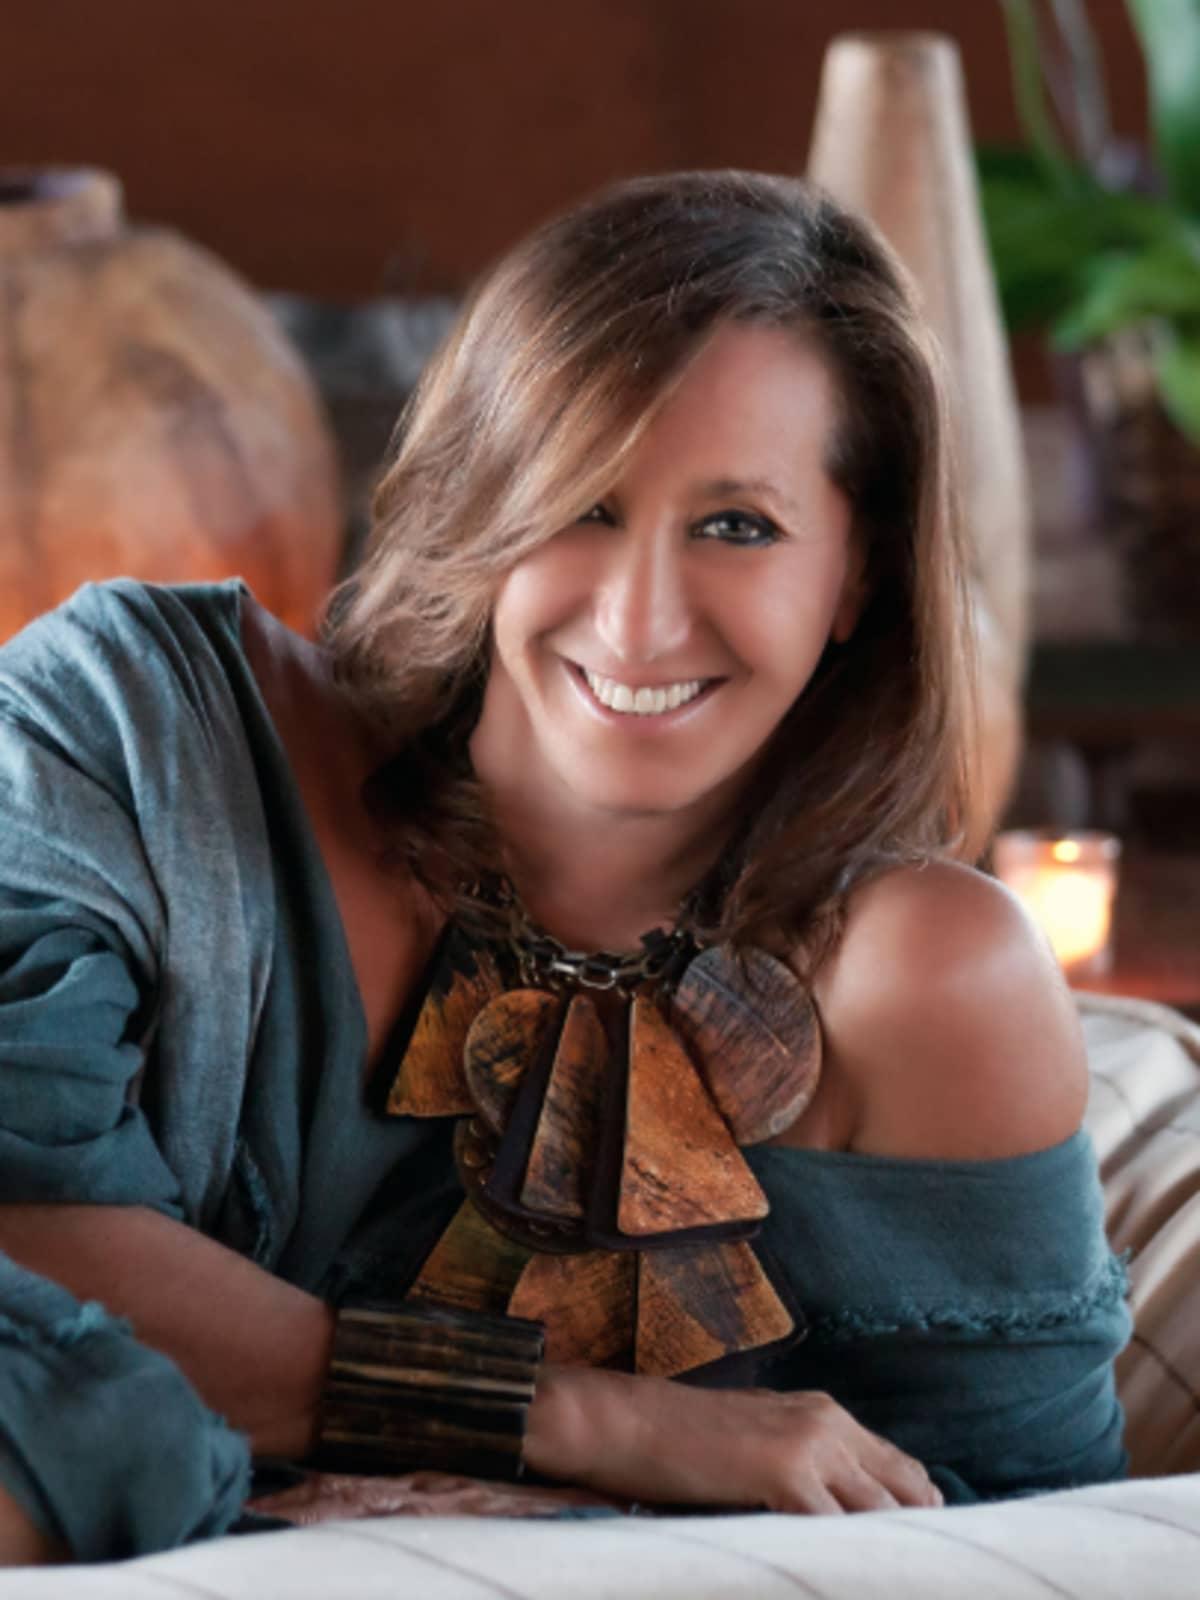 Donna Karan in Urban Zen photo